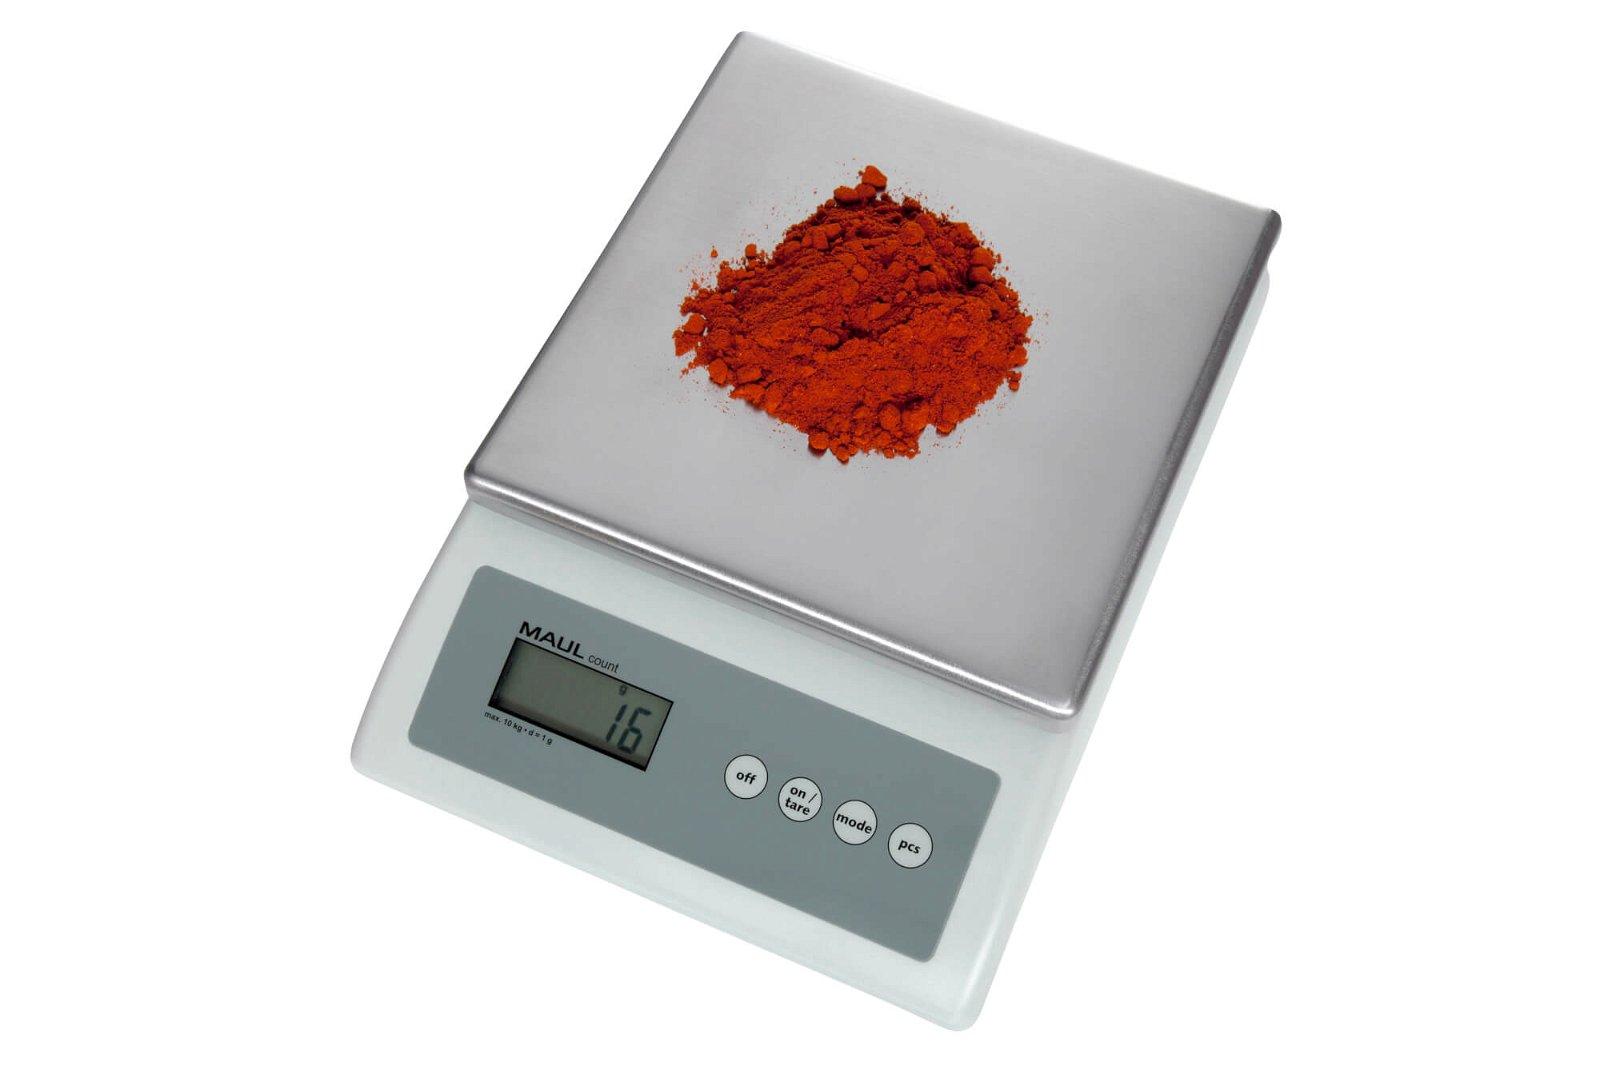 Zählwaage MAULcount, 10 kg, grau